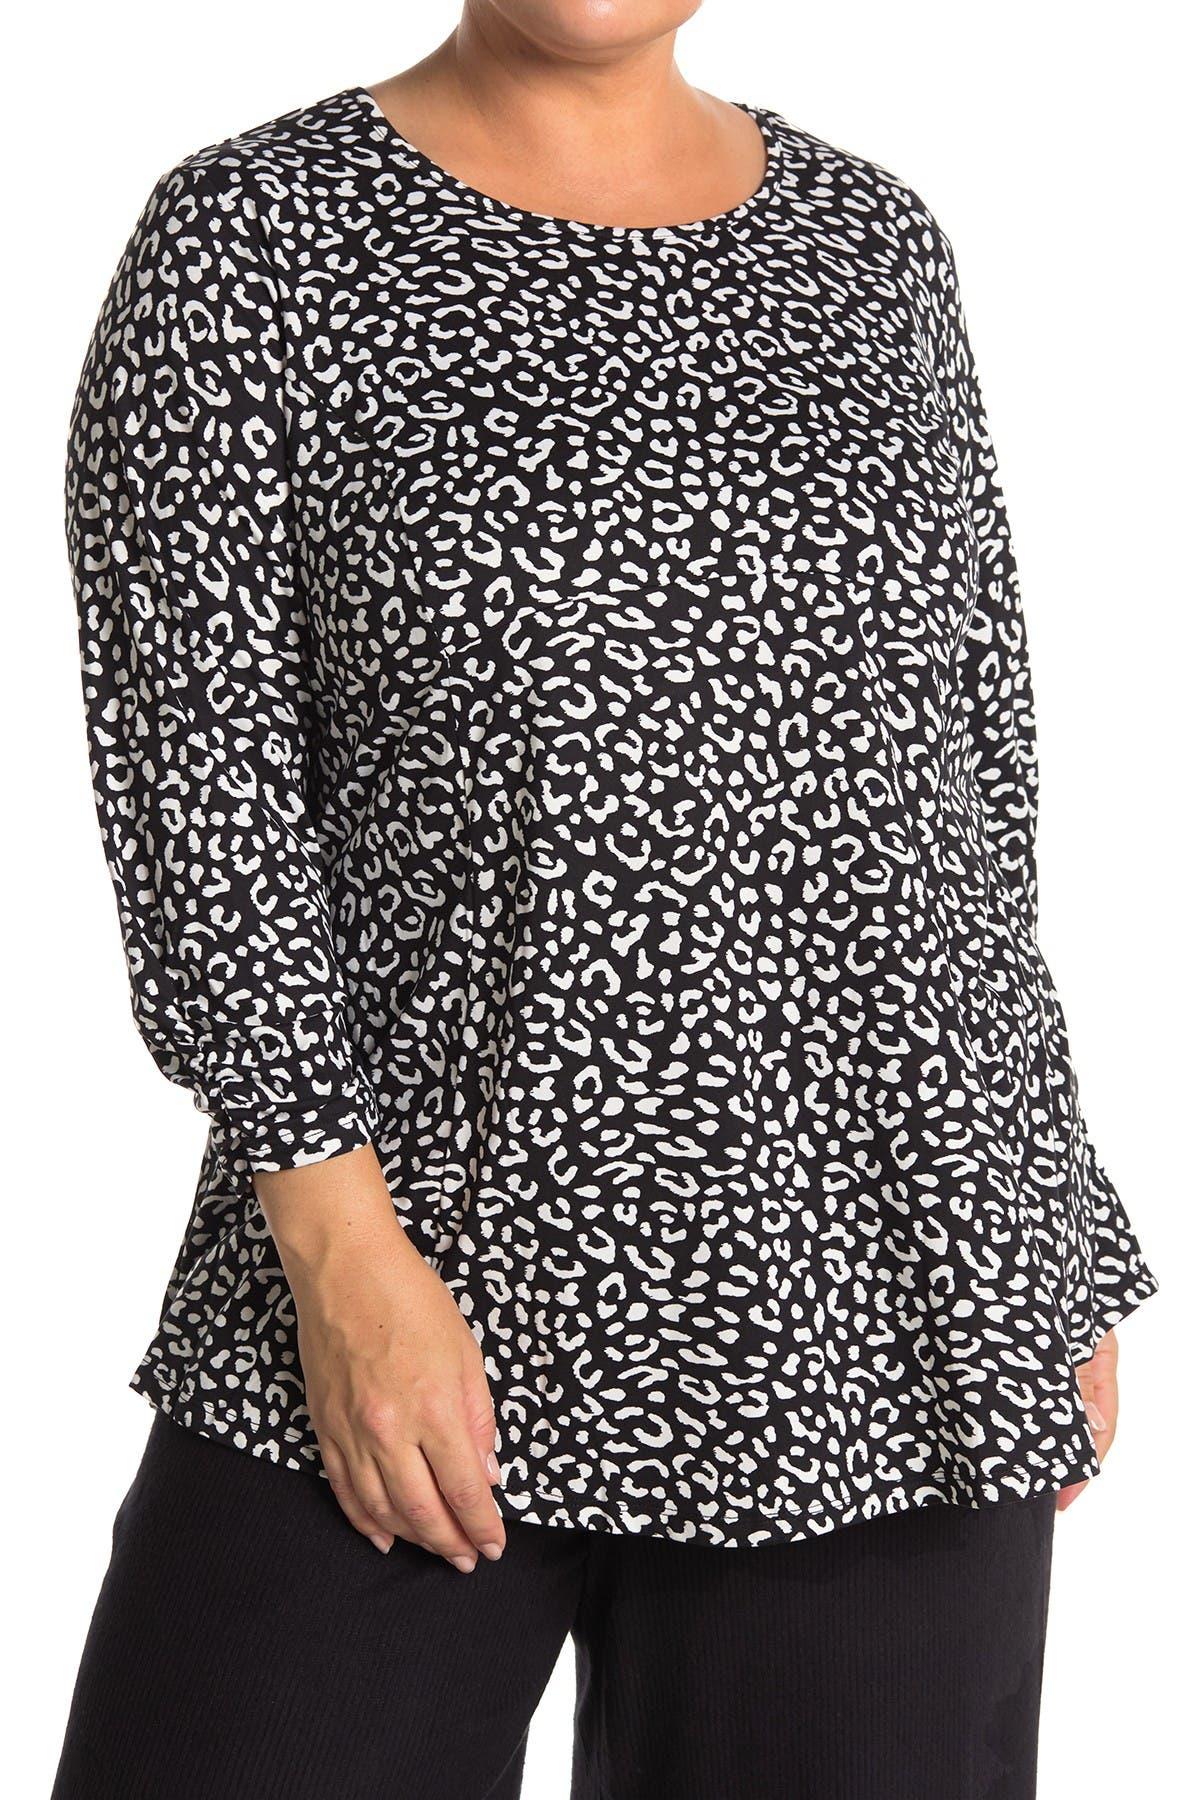 Image of Bobeau Patterned 3/4 Sleeve Babydoll Top